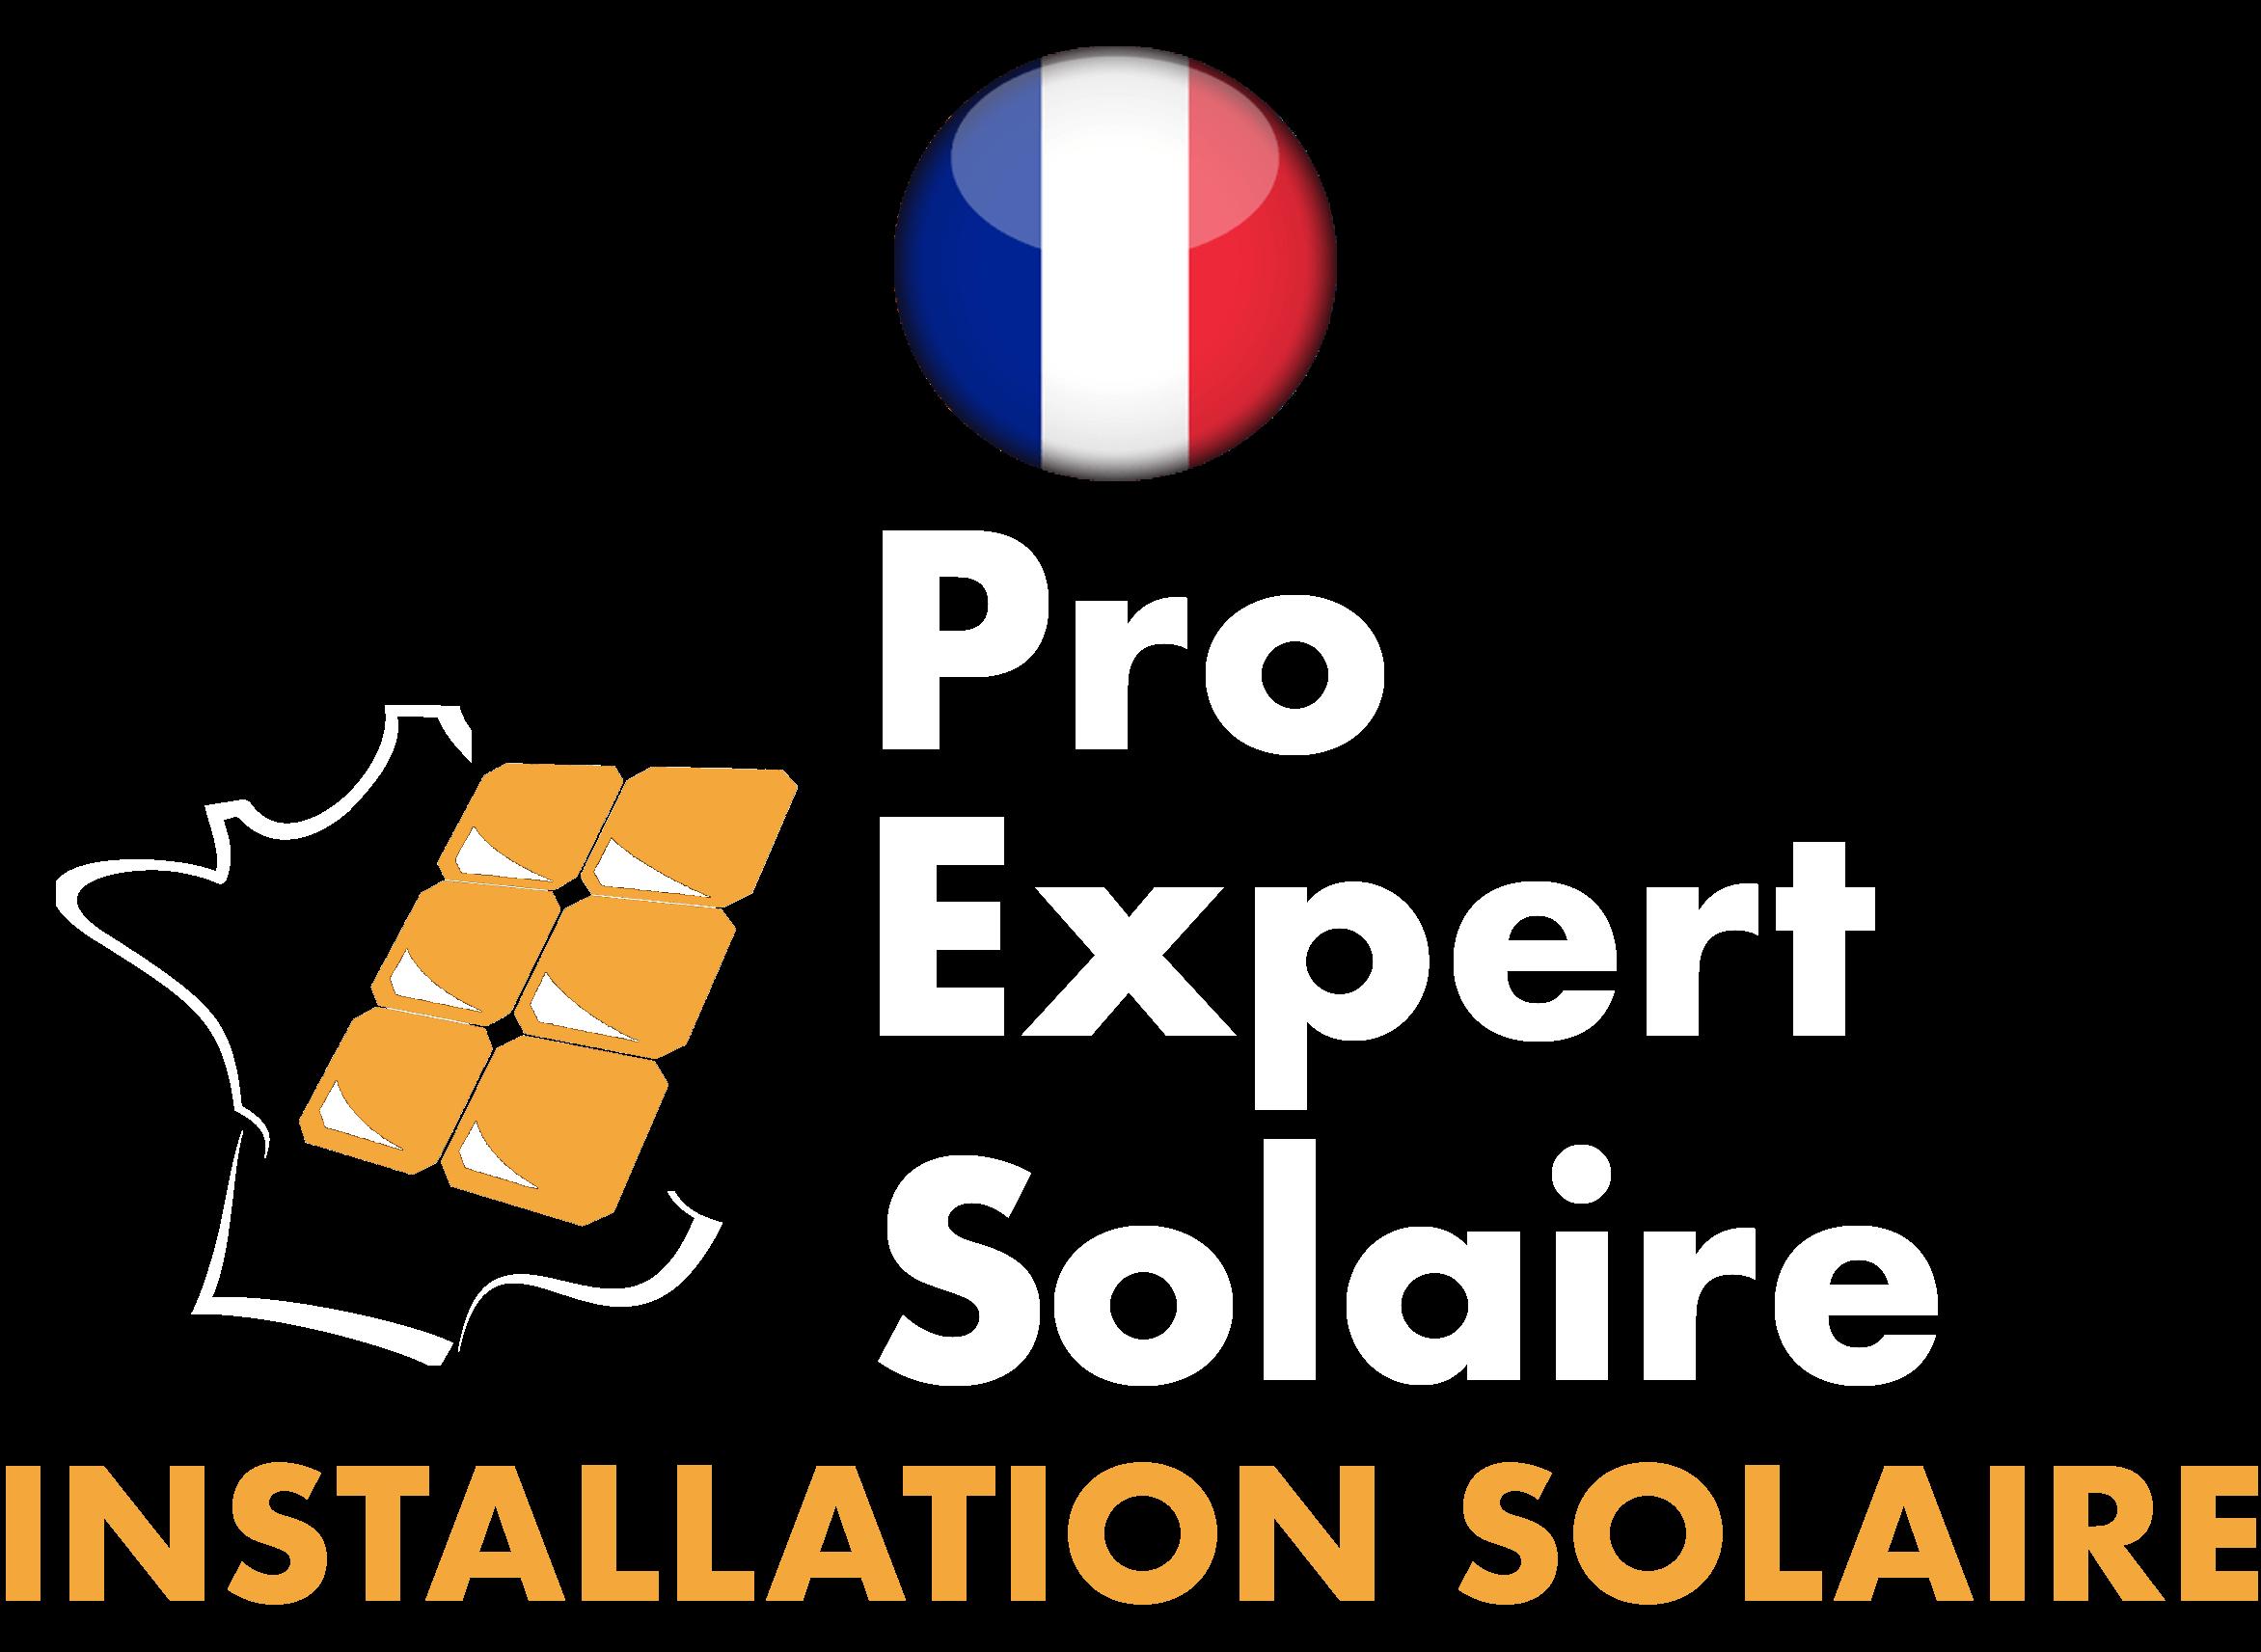 Pro Expert Solaire Installation Photovoltaique